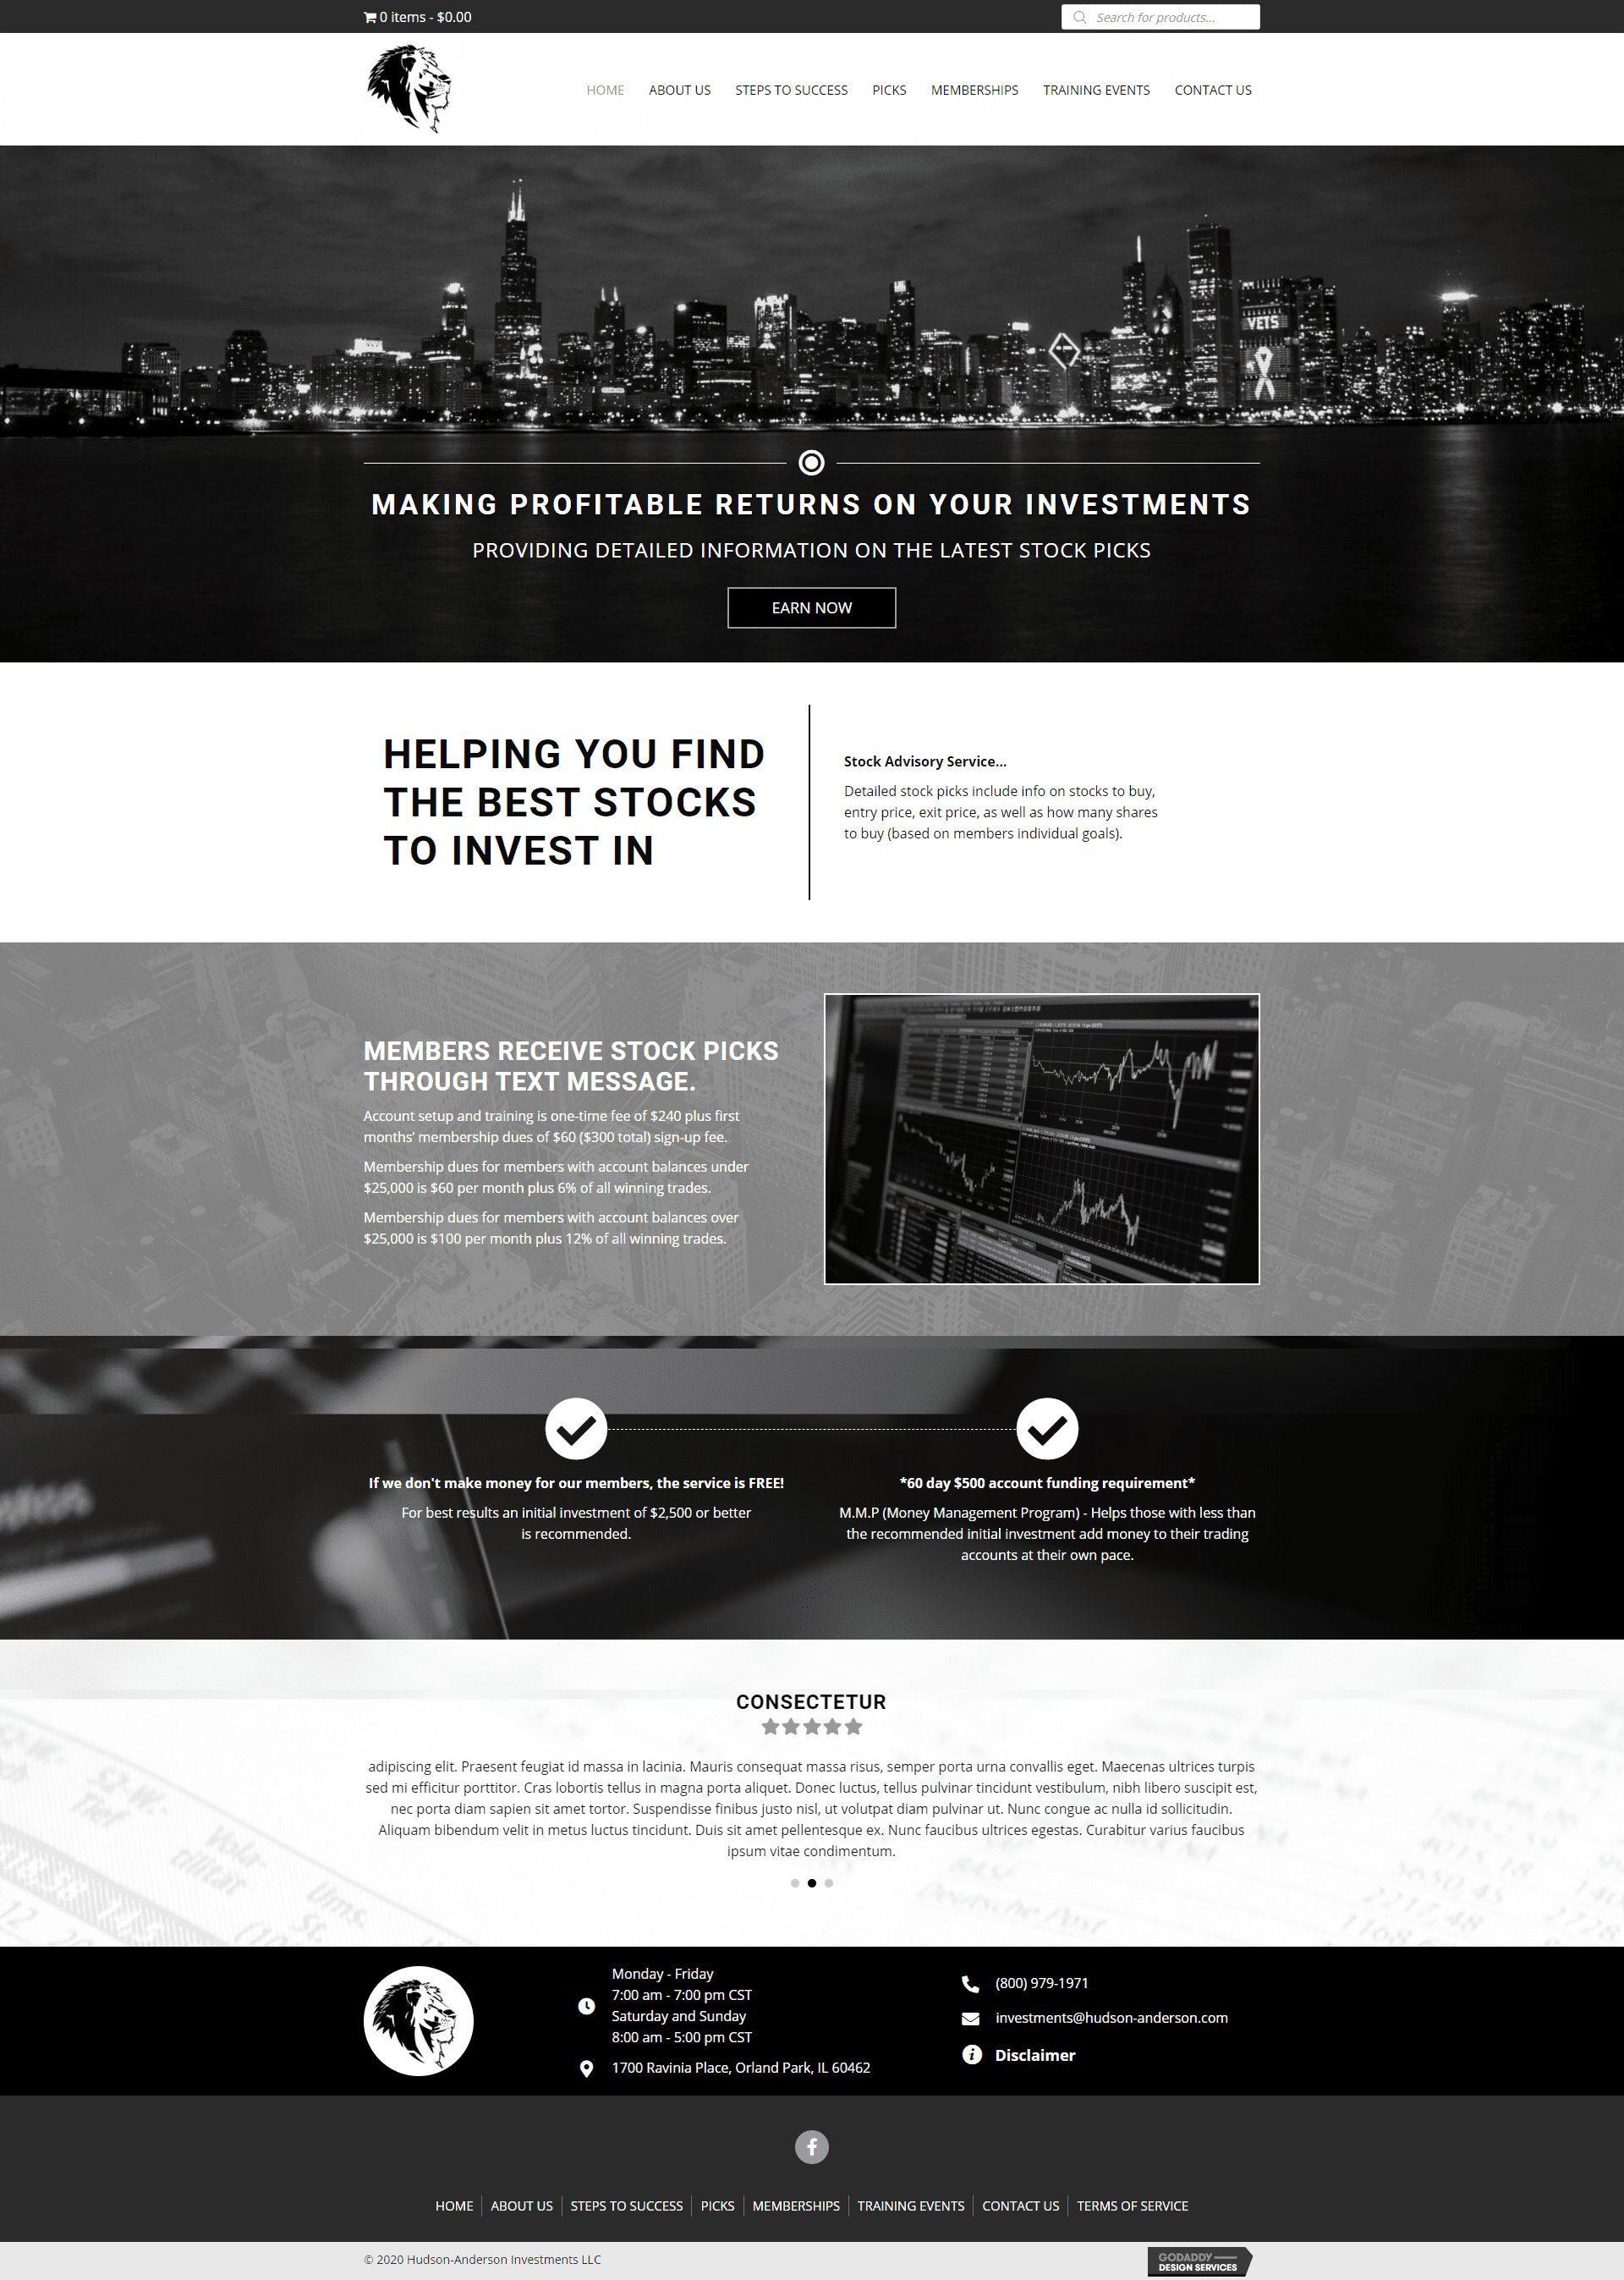 screencapture-e17-49e-myftpupload-desktop